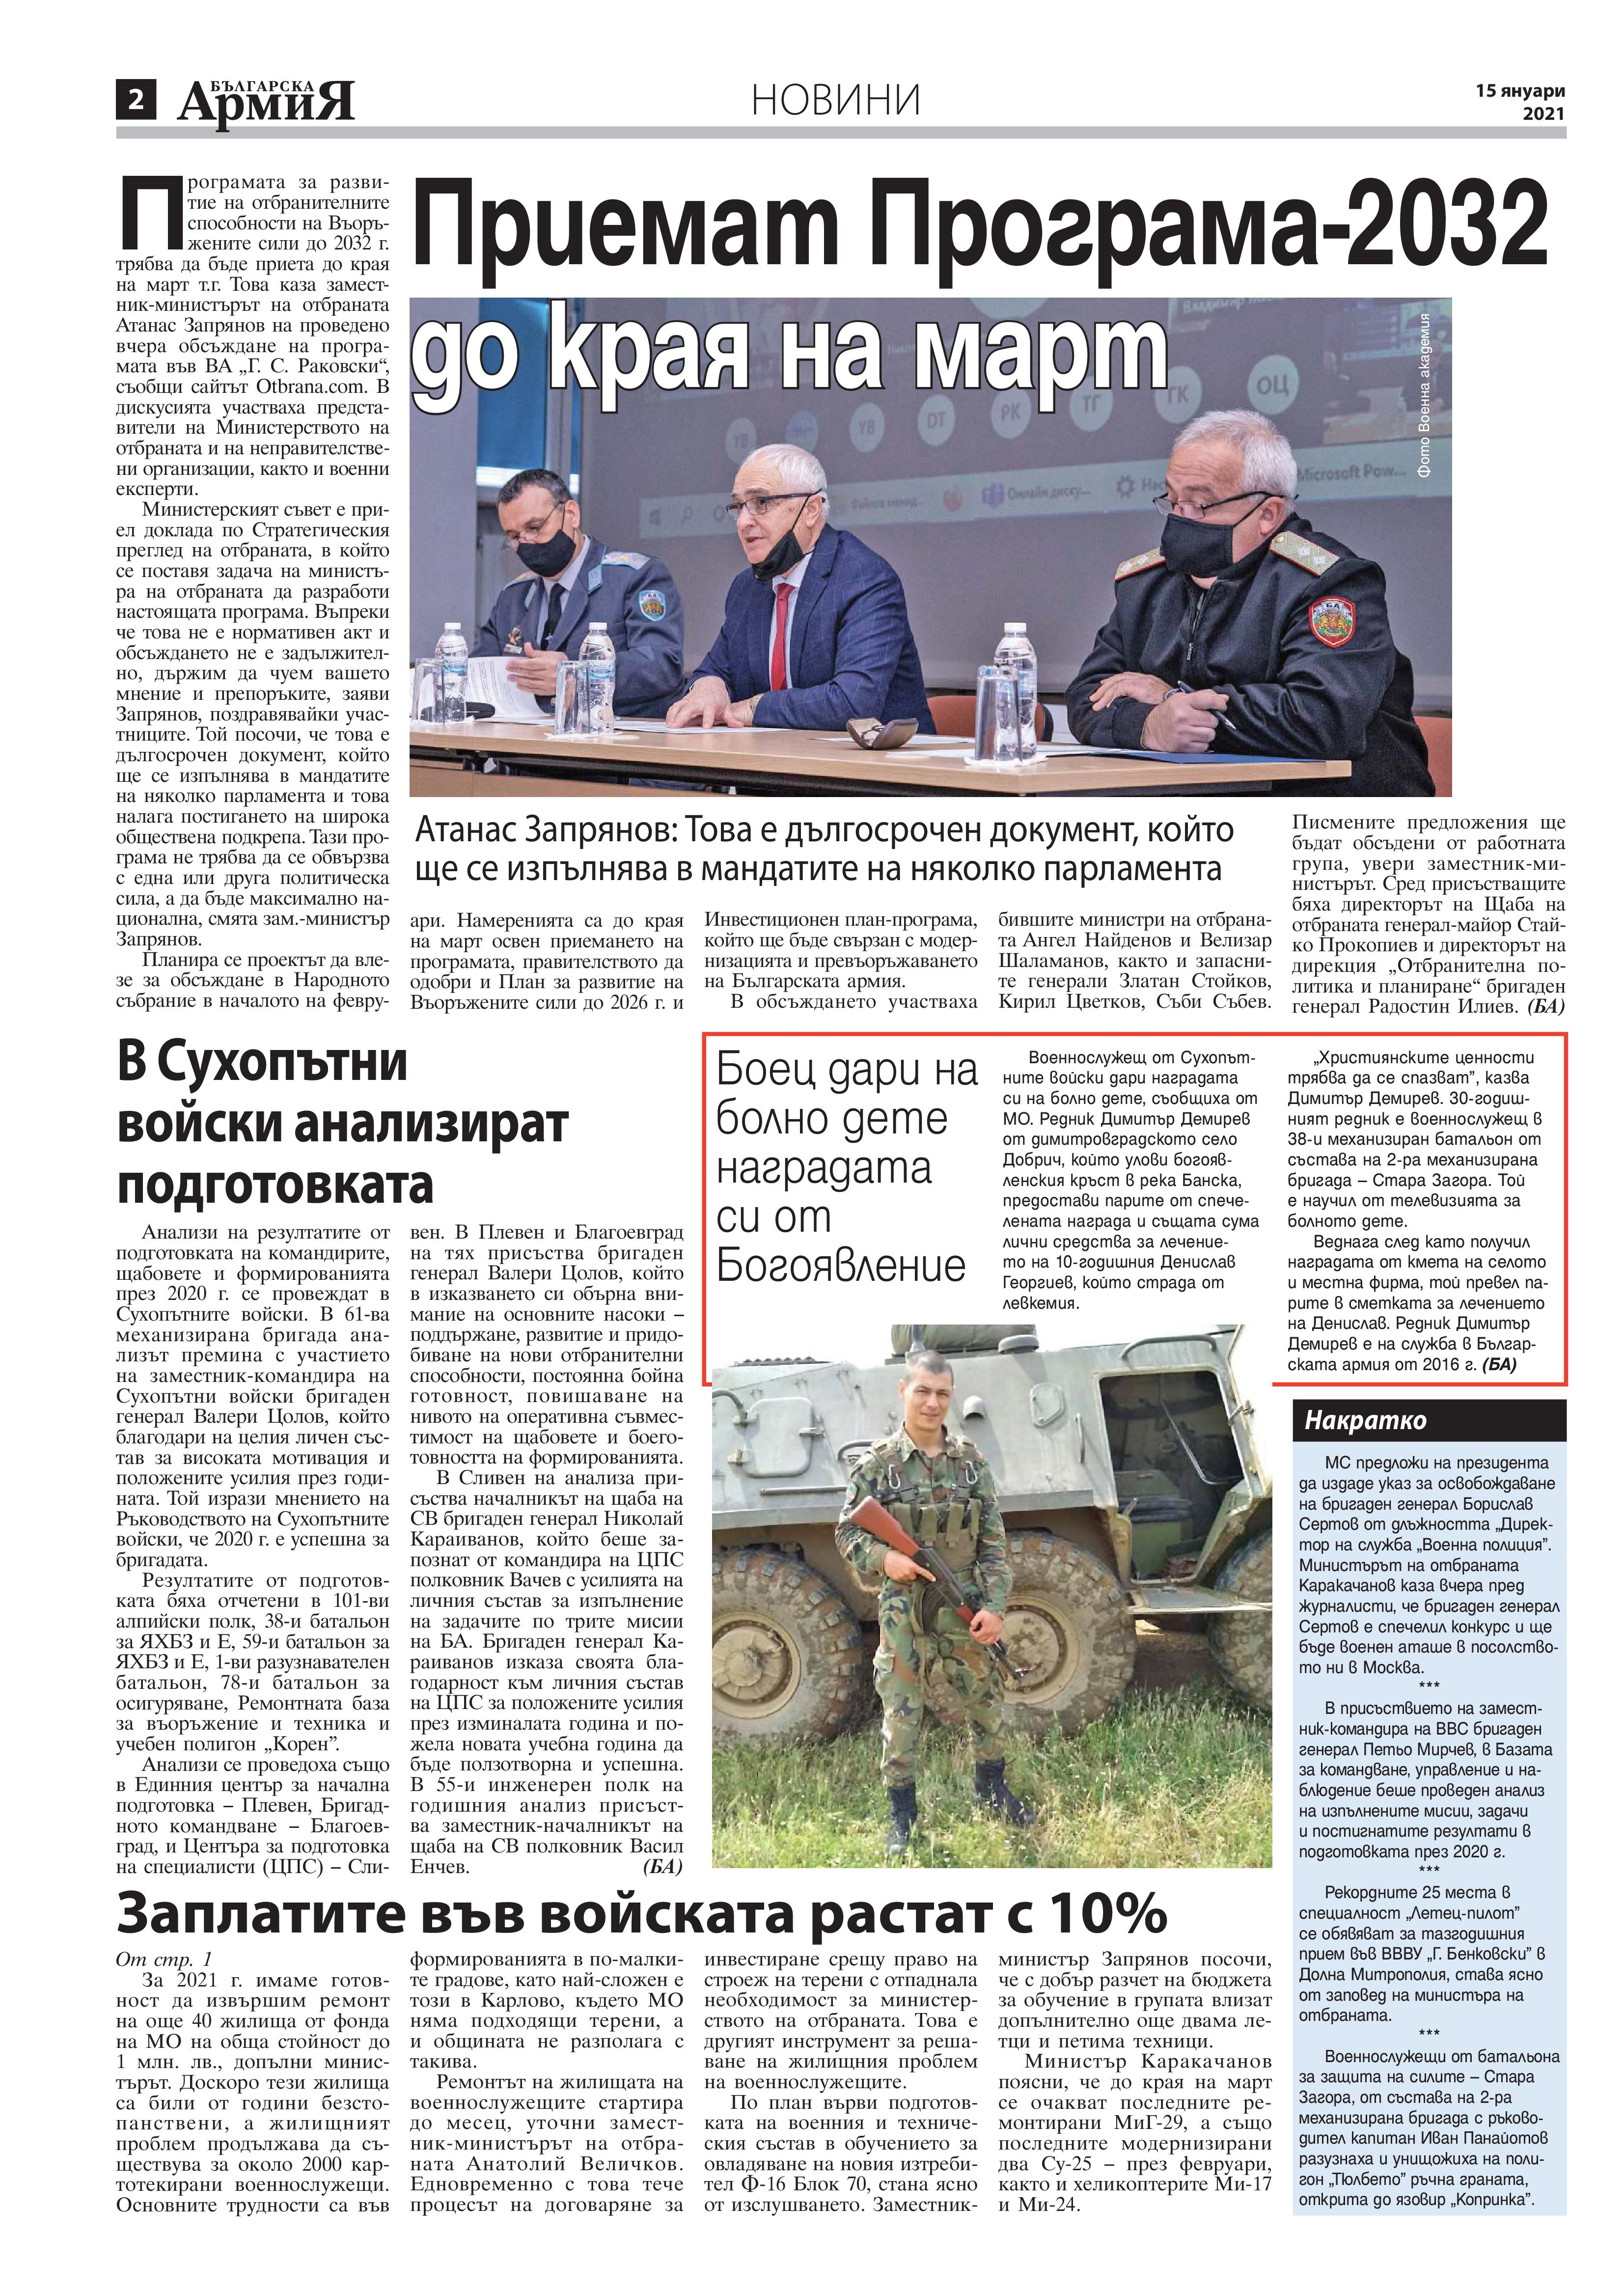 https://www.armymedia.bg/wp-content/uploads/2015/06/02-55.jpg